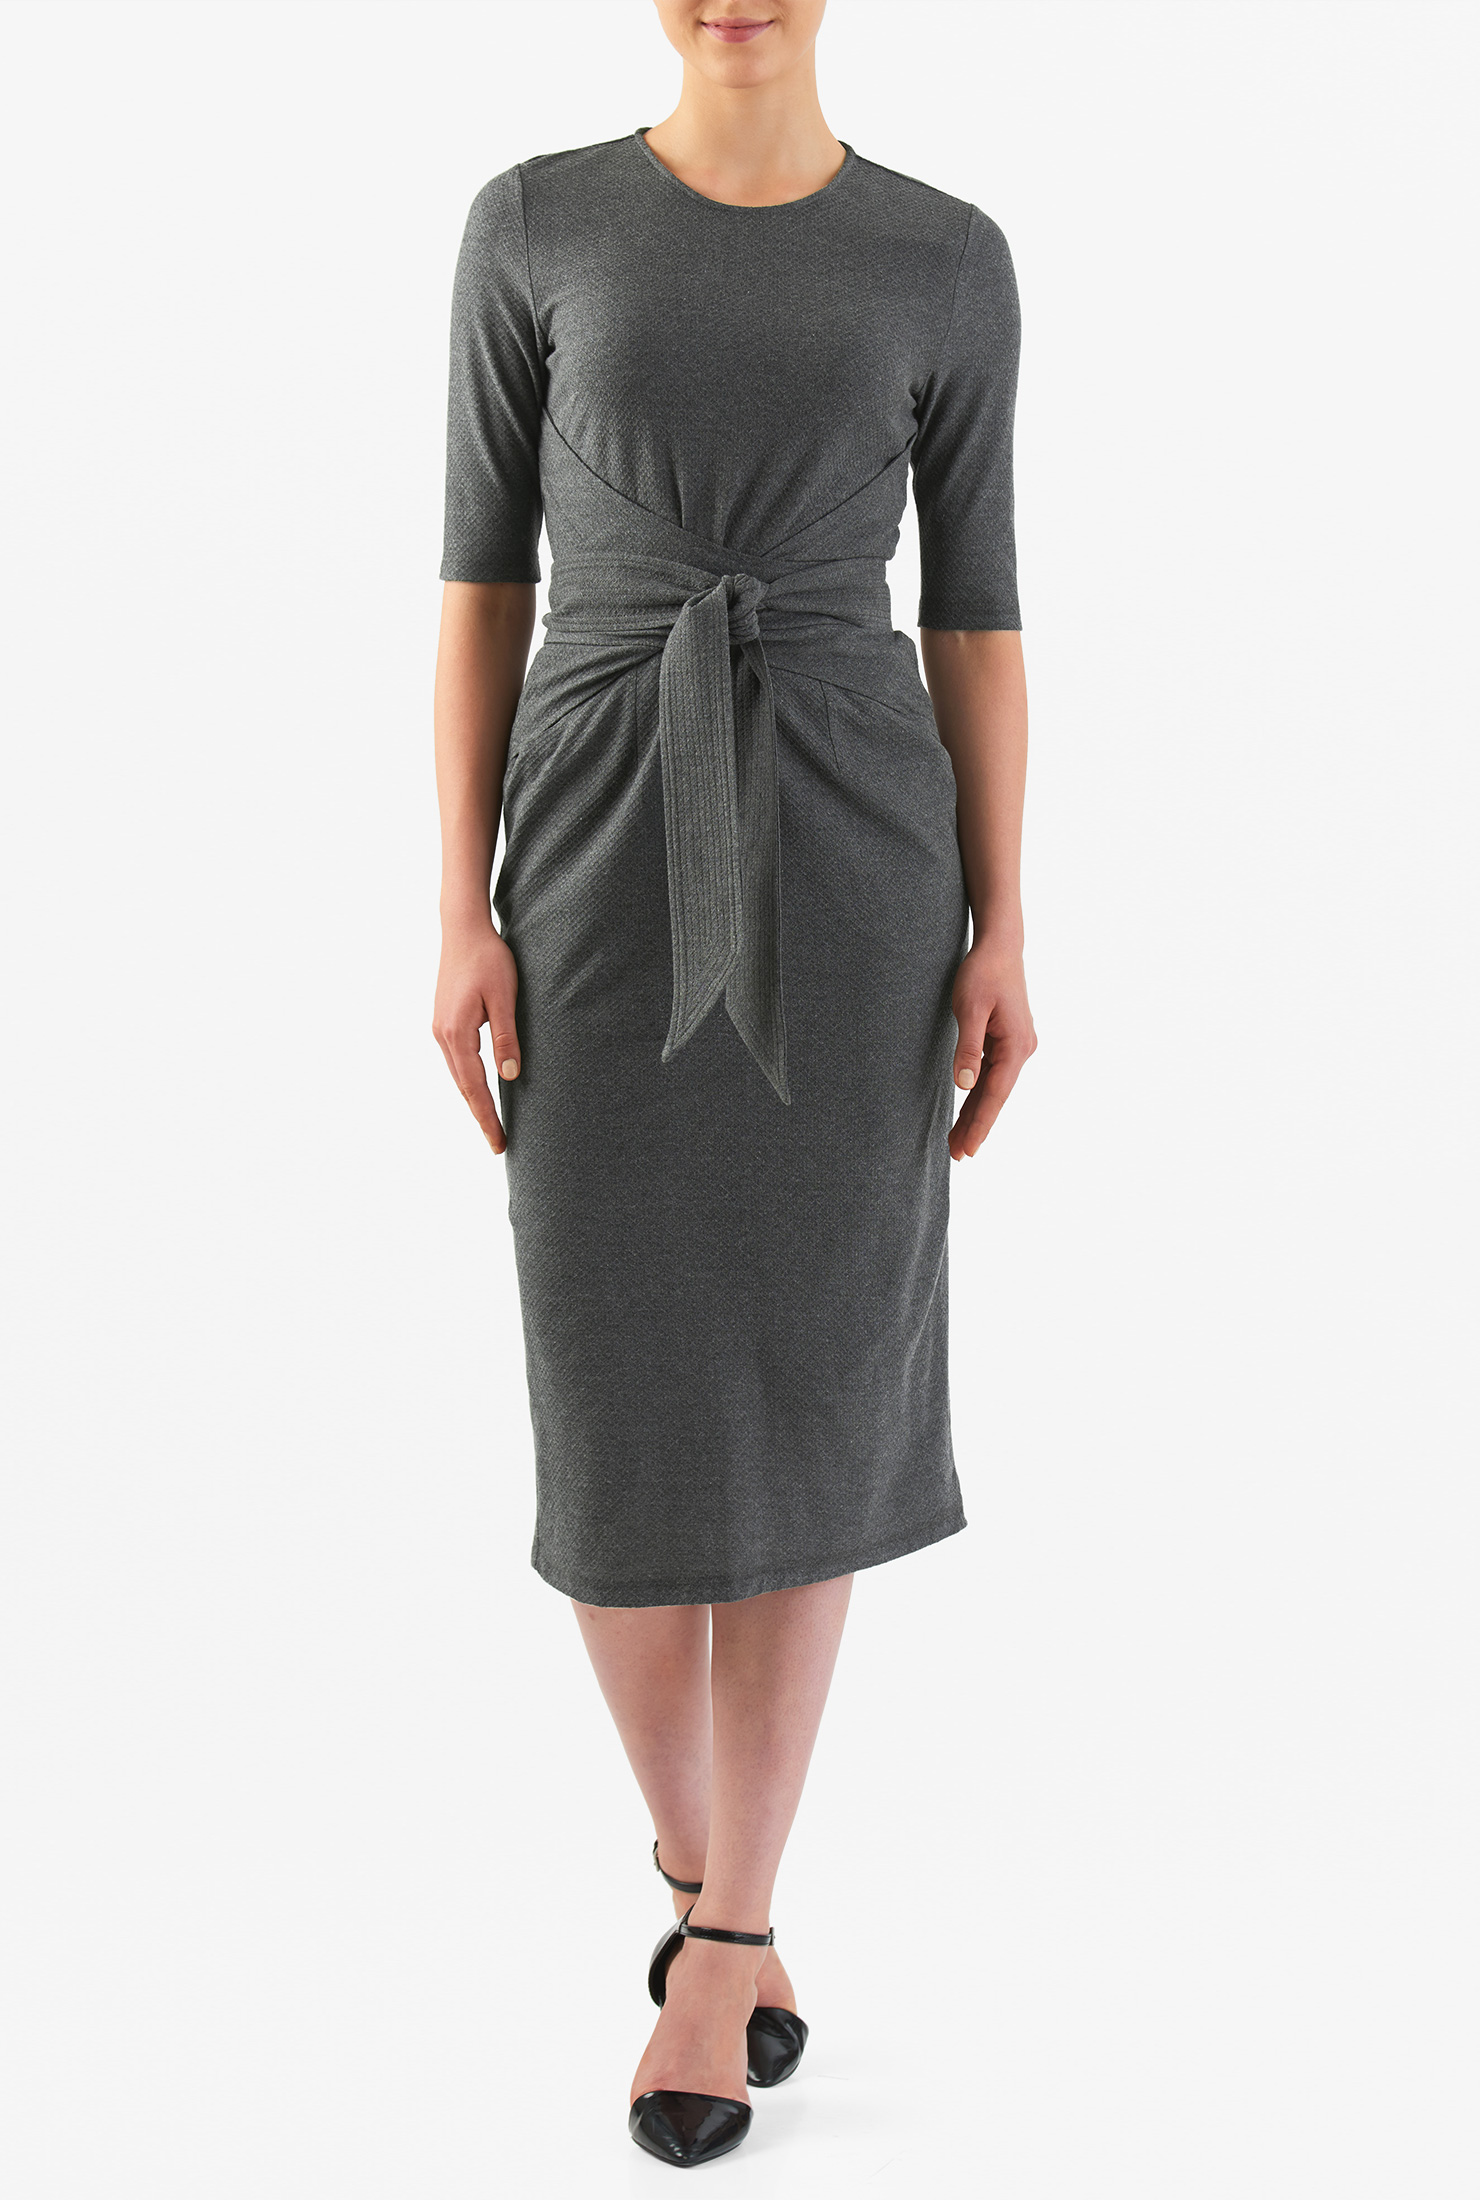 eShakti Women's Obi belt textured cotton knit sheath dress